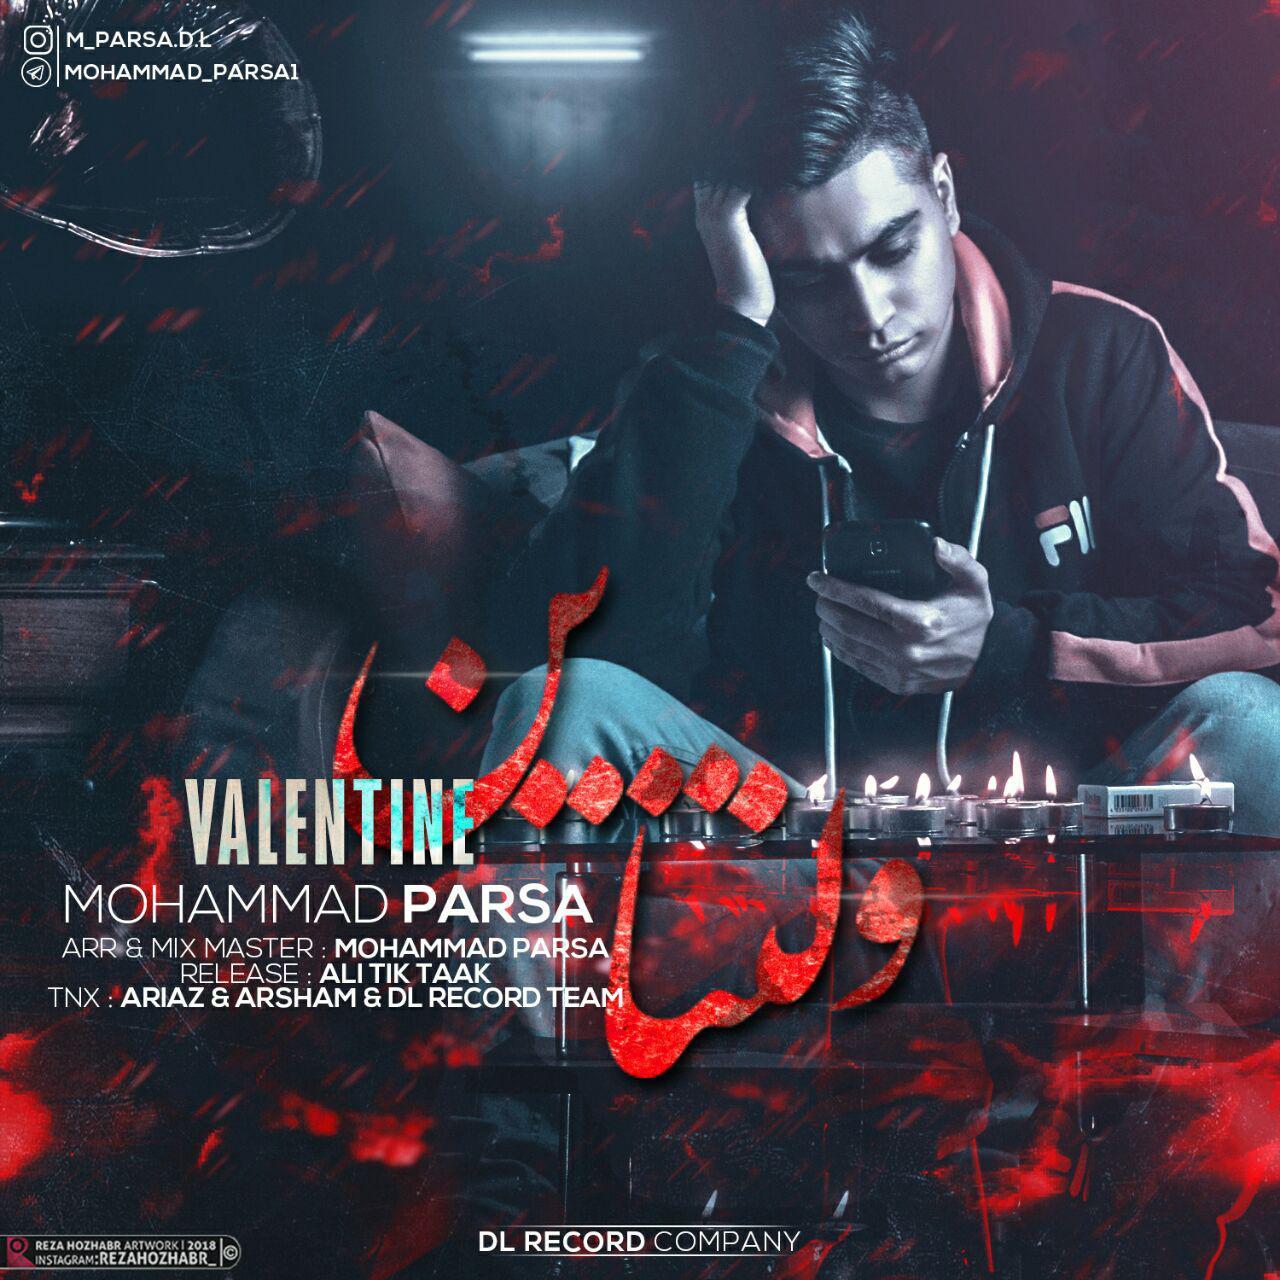 Mohammad Parsa - Valentine